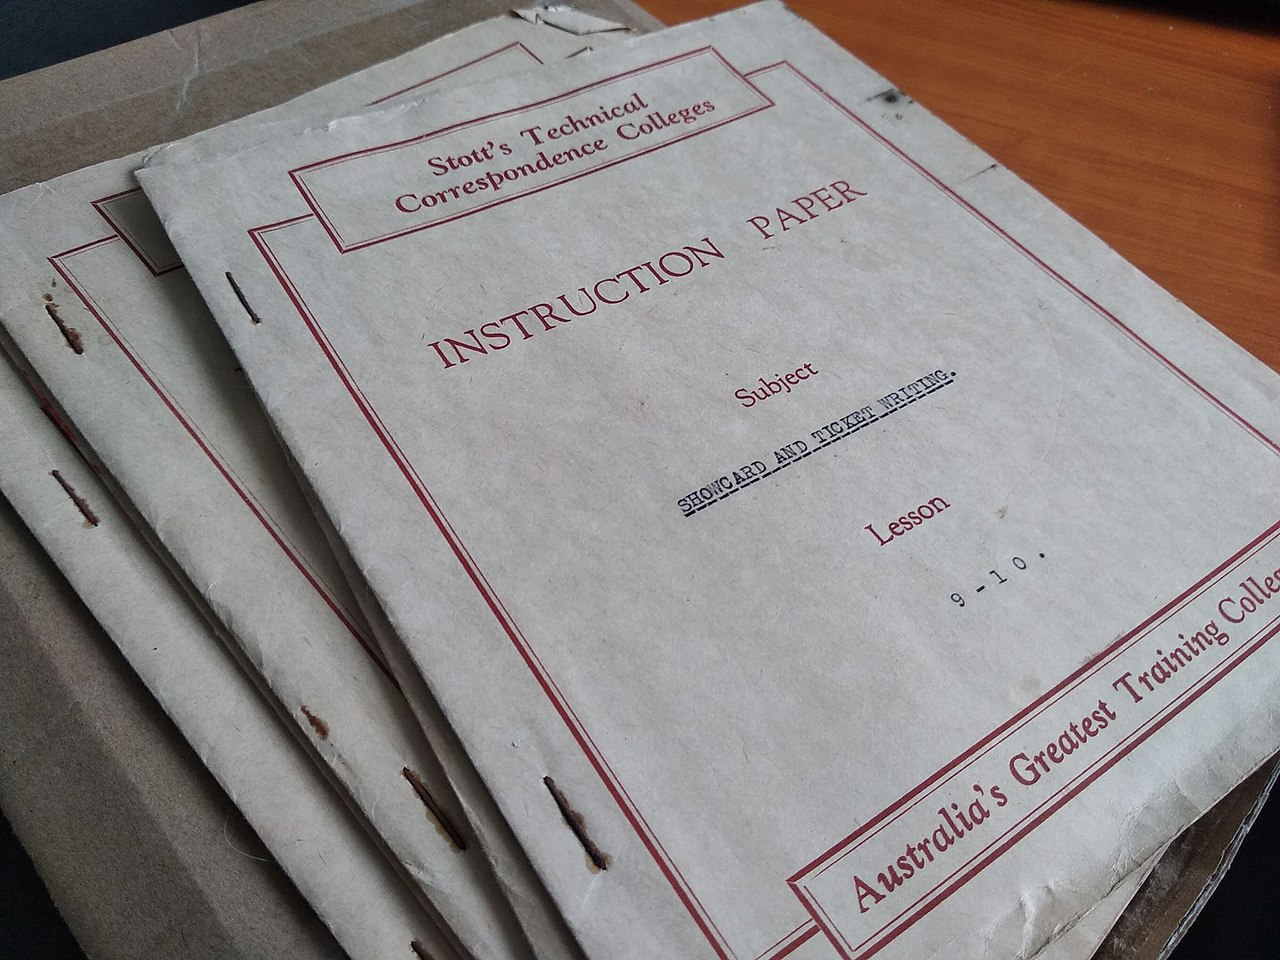 File:Instruction manual.jpg